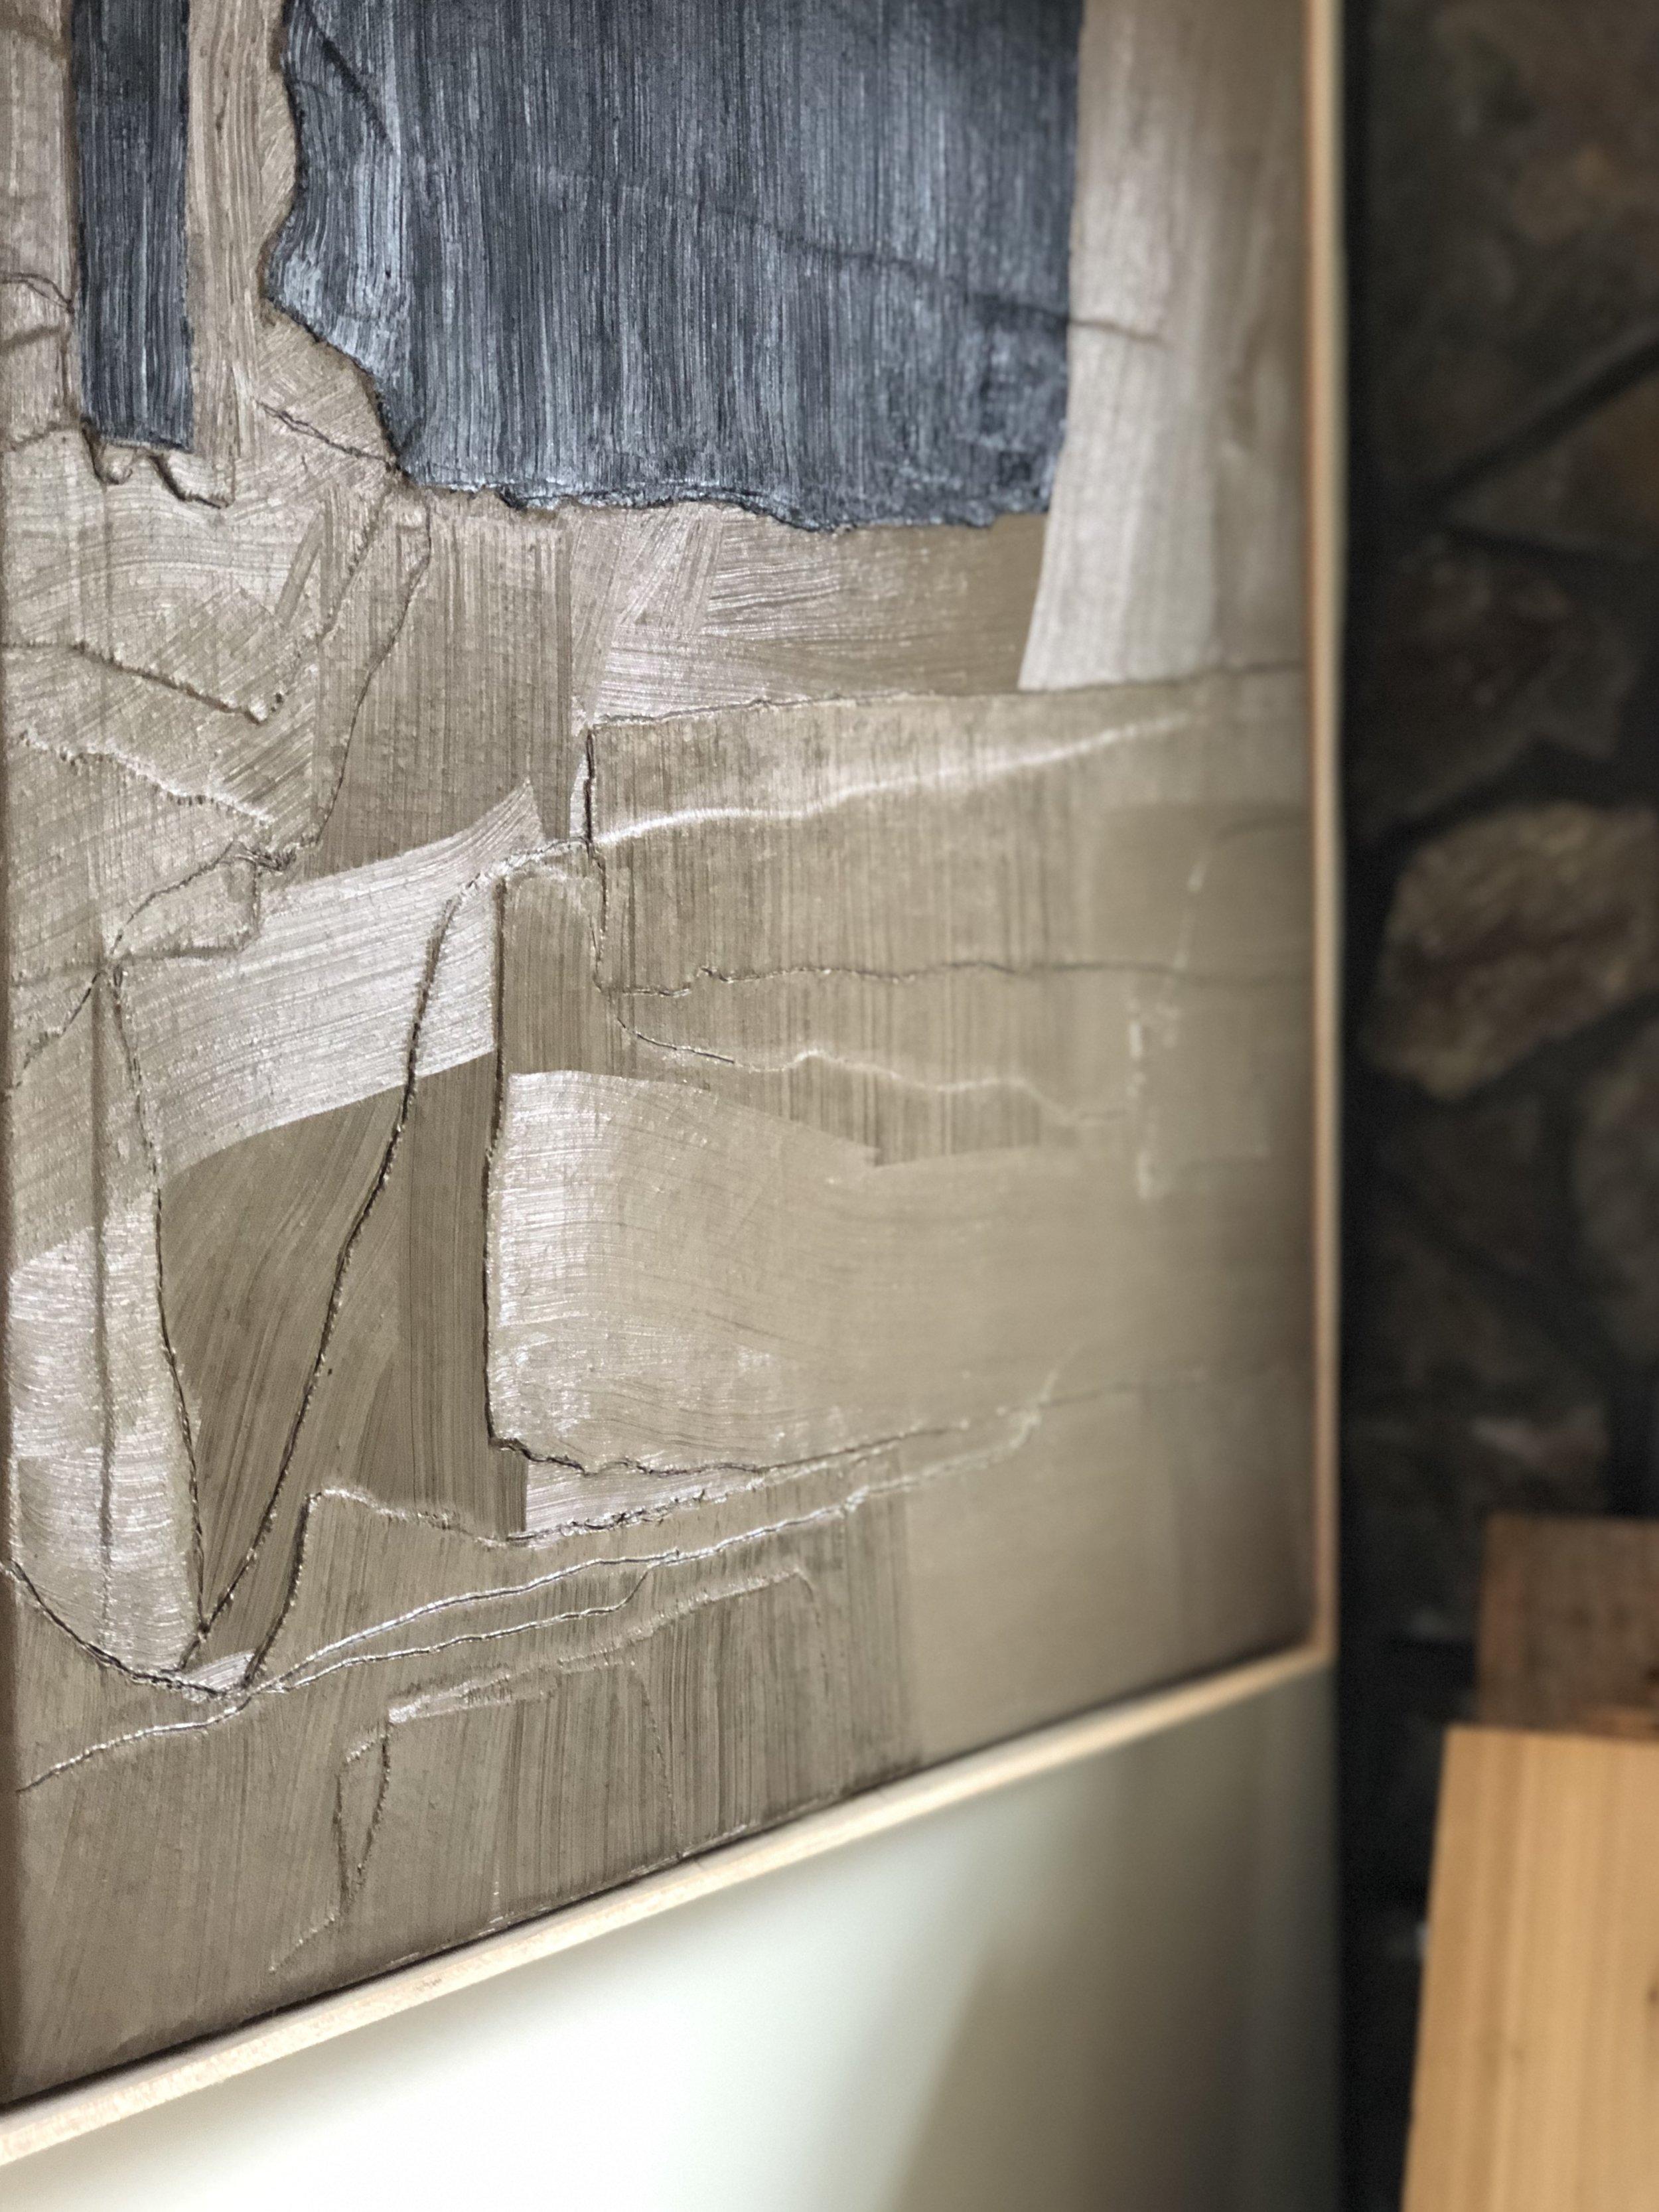 Brian abstract detail.jpg